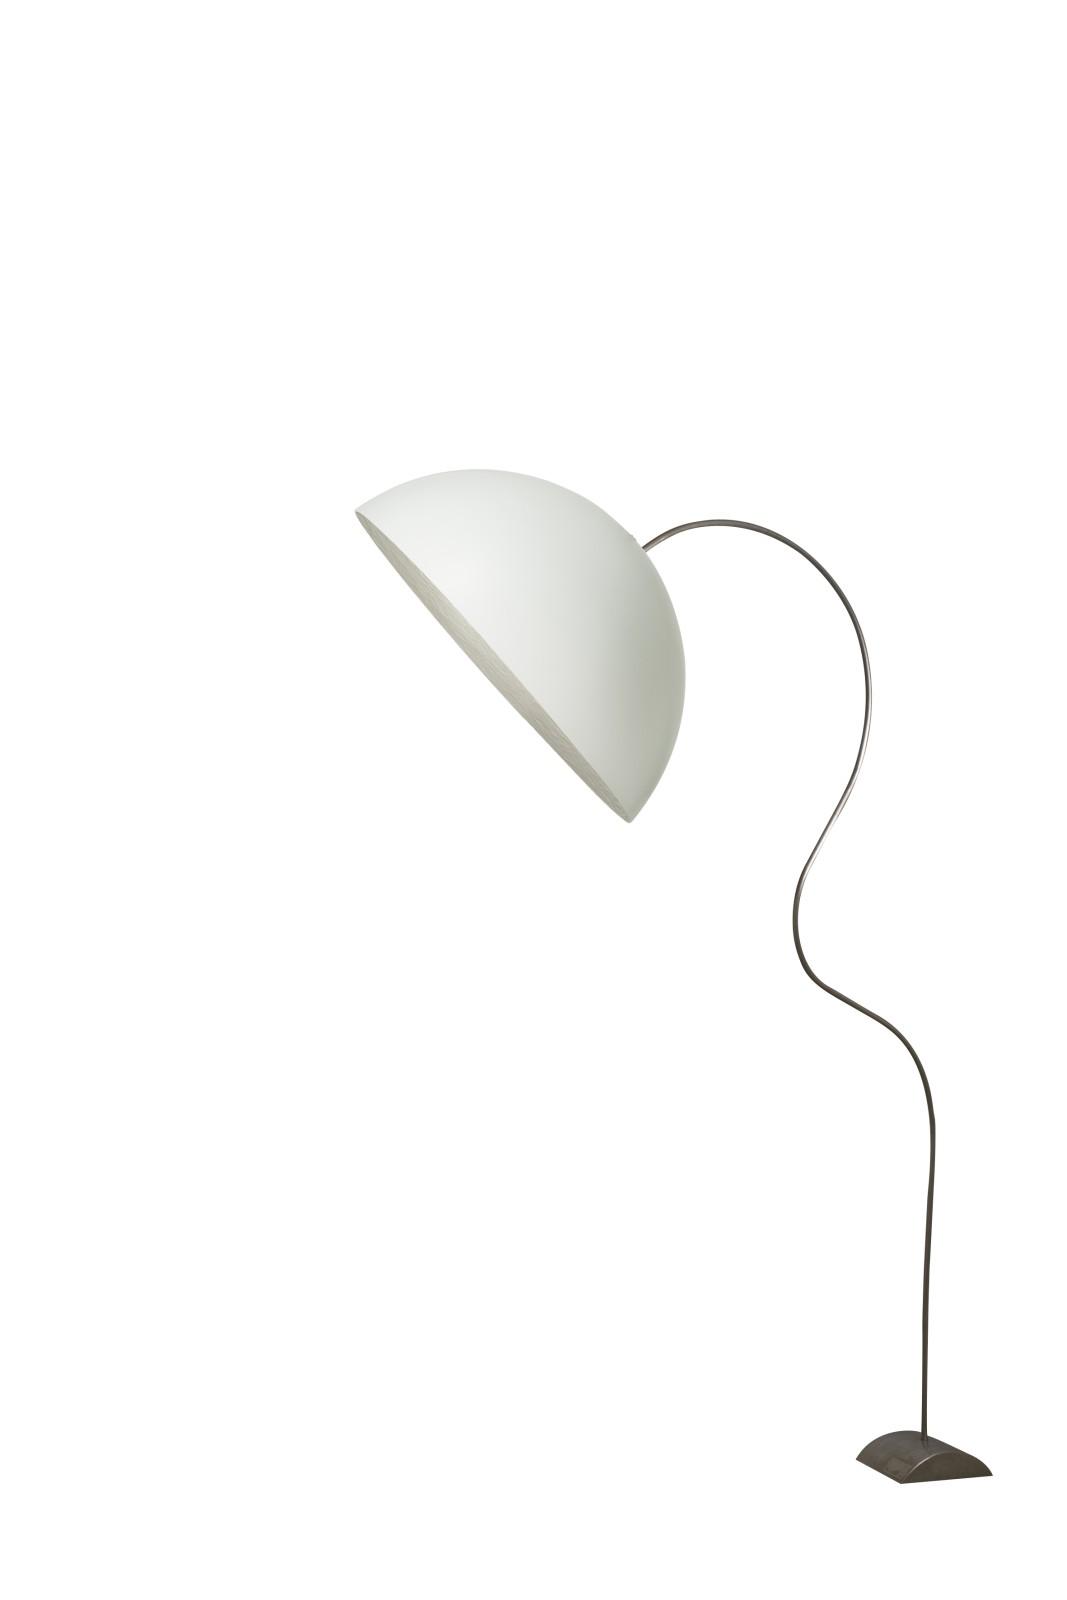 Mezza Luna Piantana Floor Lamp White, Silver